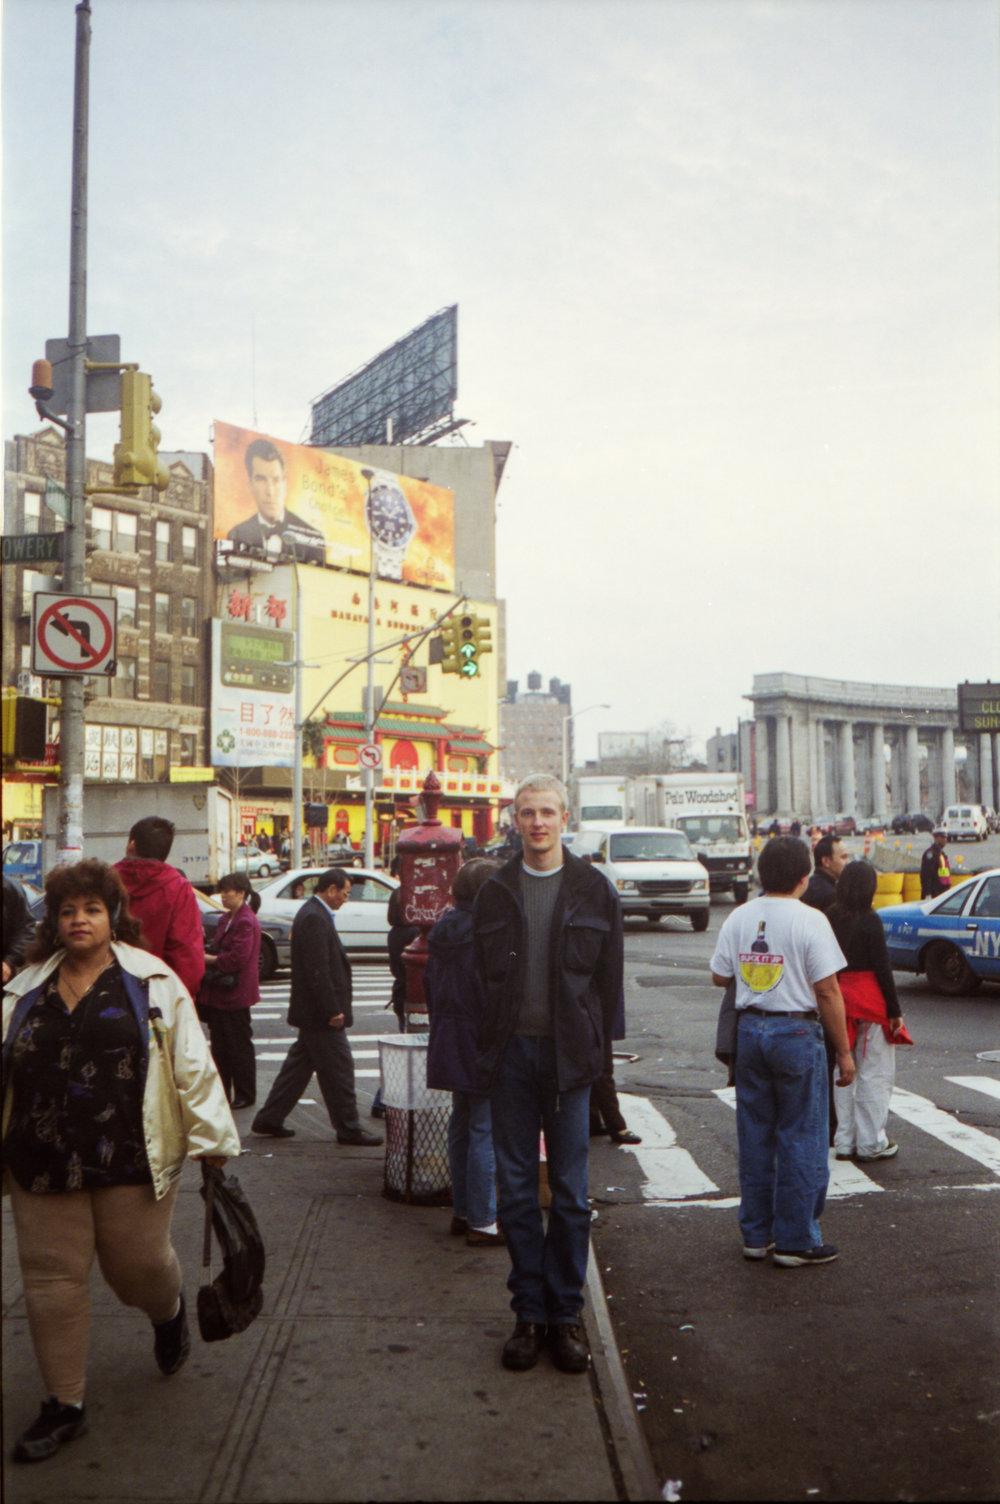 NYC-1999-026.jpg